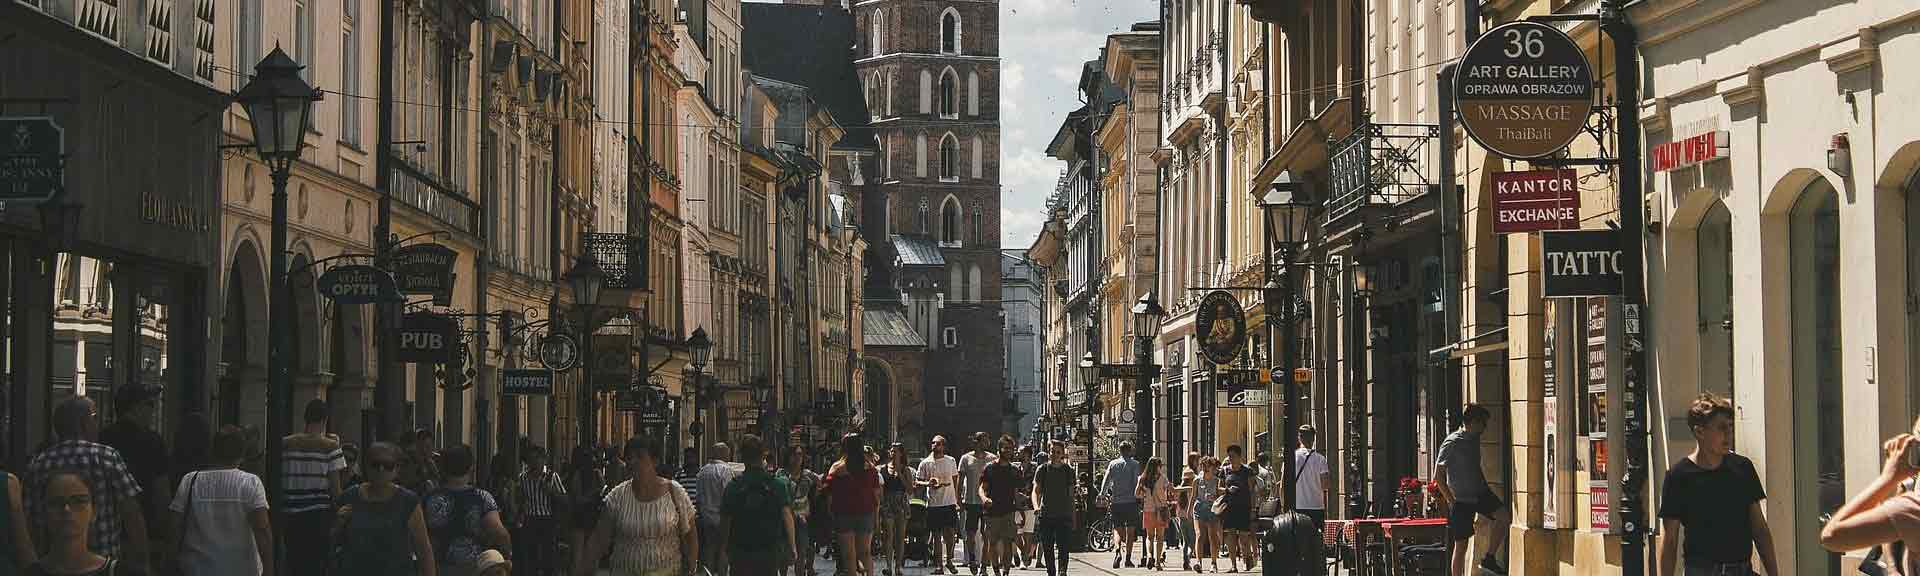 Polska 2000